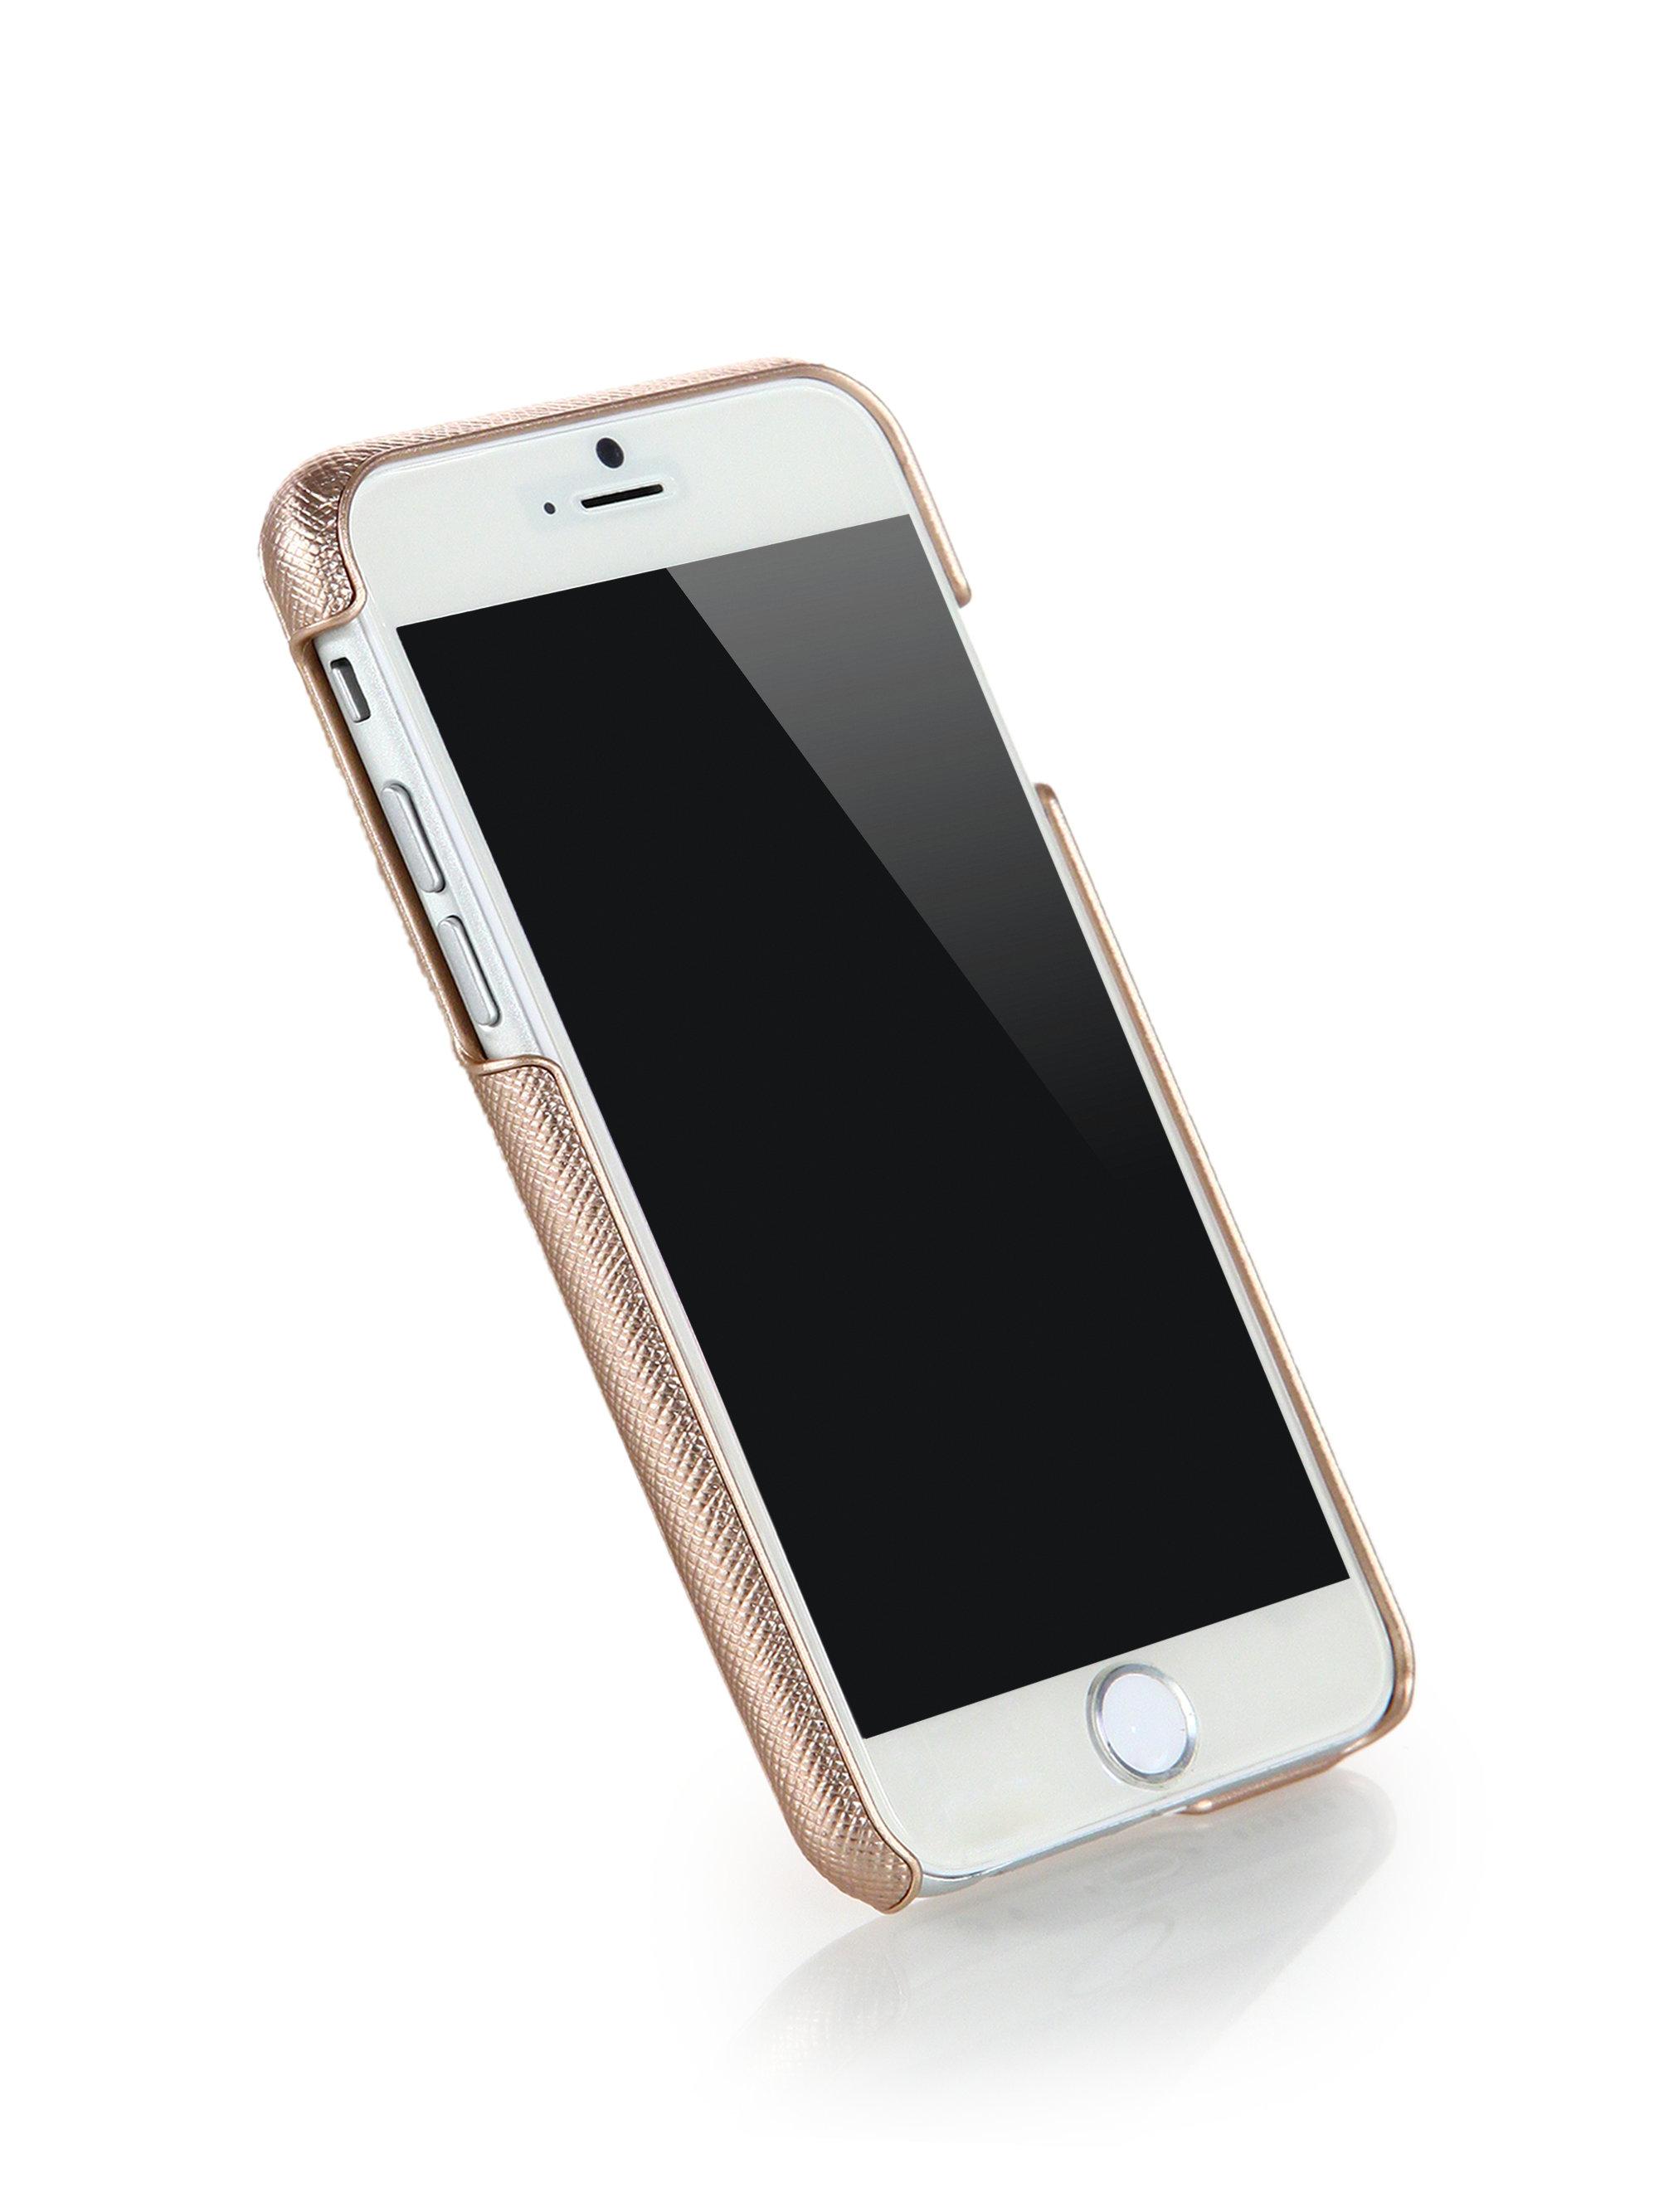 Insignia Iphone S Case